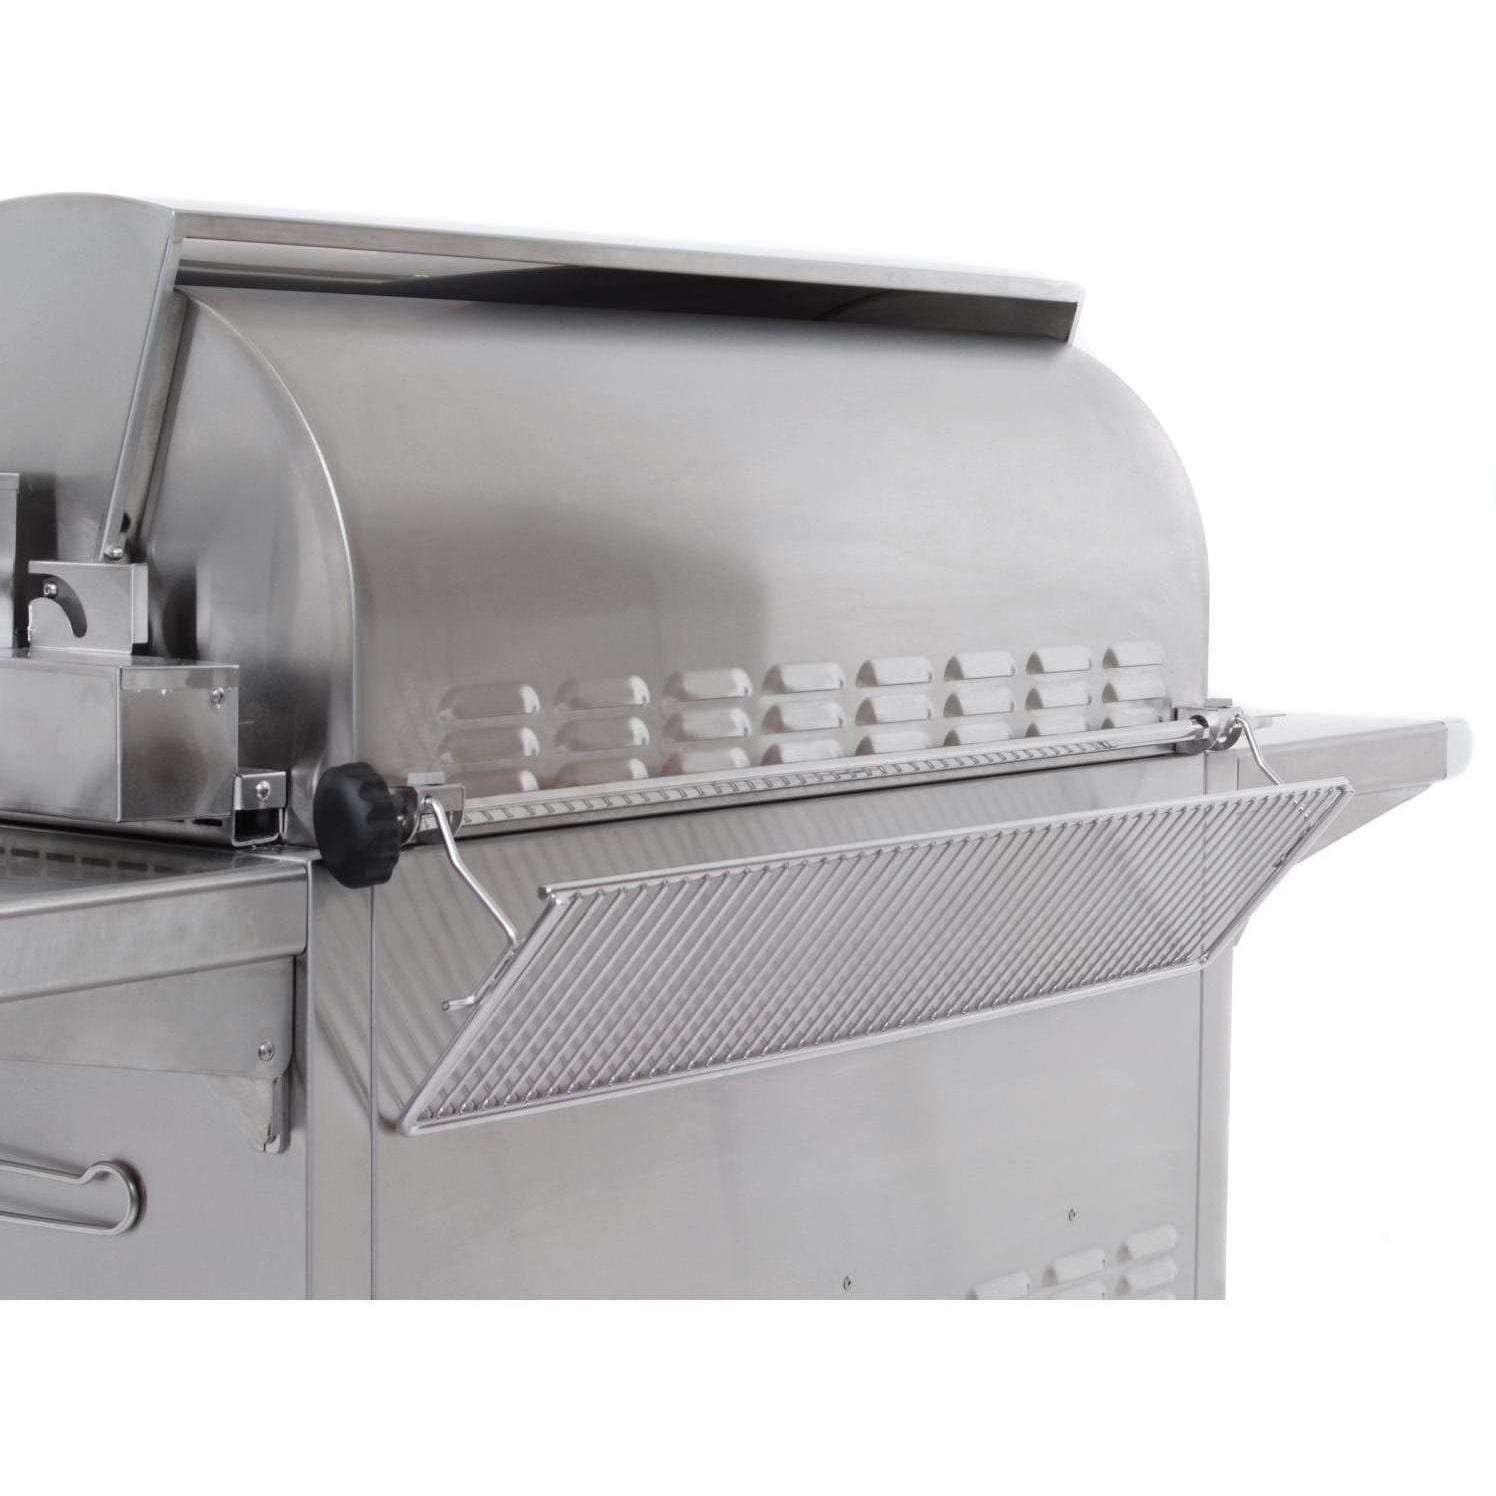 Fire Magic Echelon Diamond E660i Natural Gas Grill on Cart